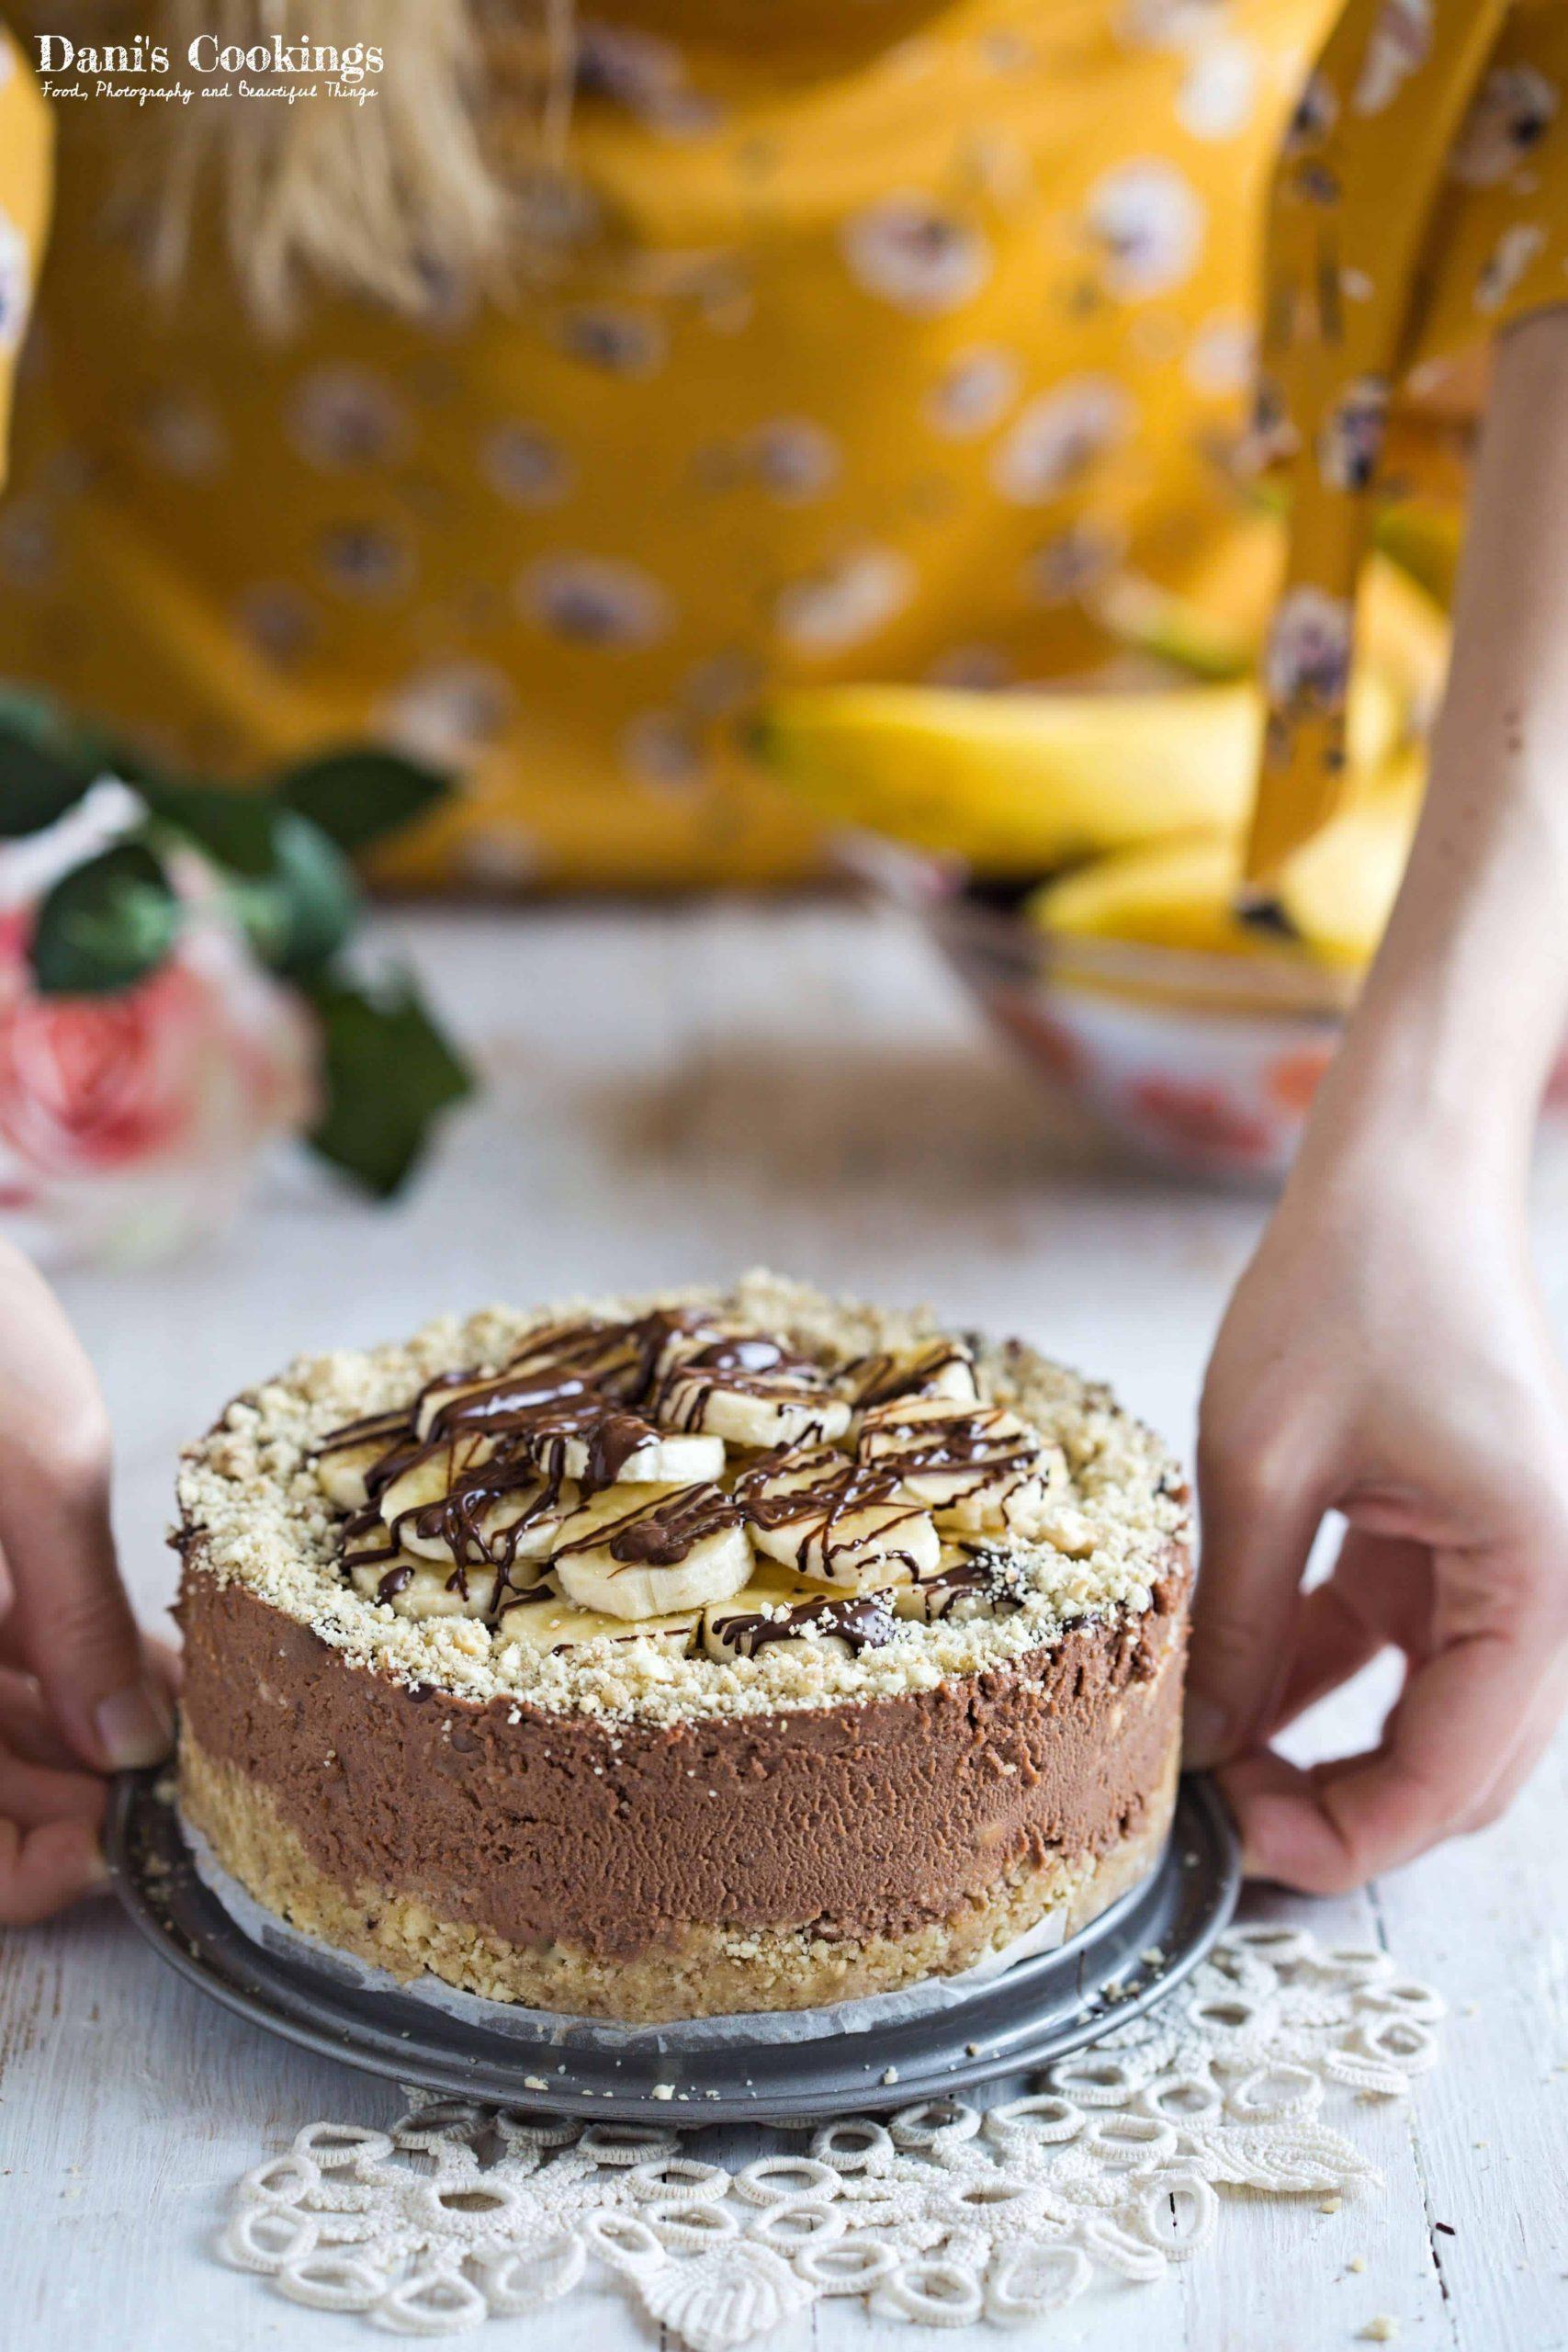 Delicious and easy no bake Chocolate Banana Mascarpone Cheesecake